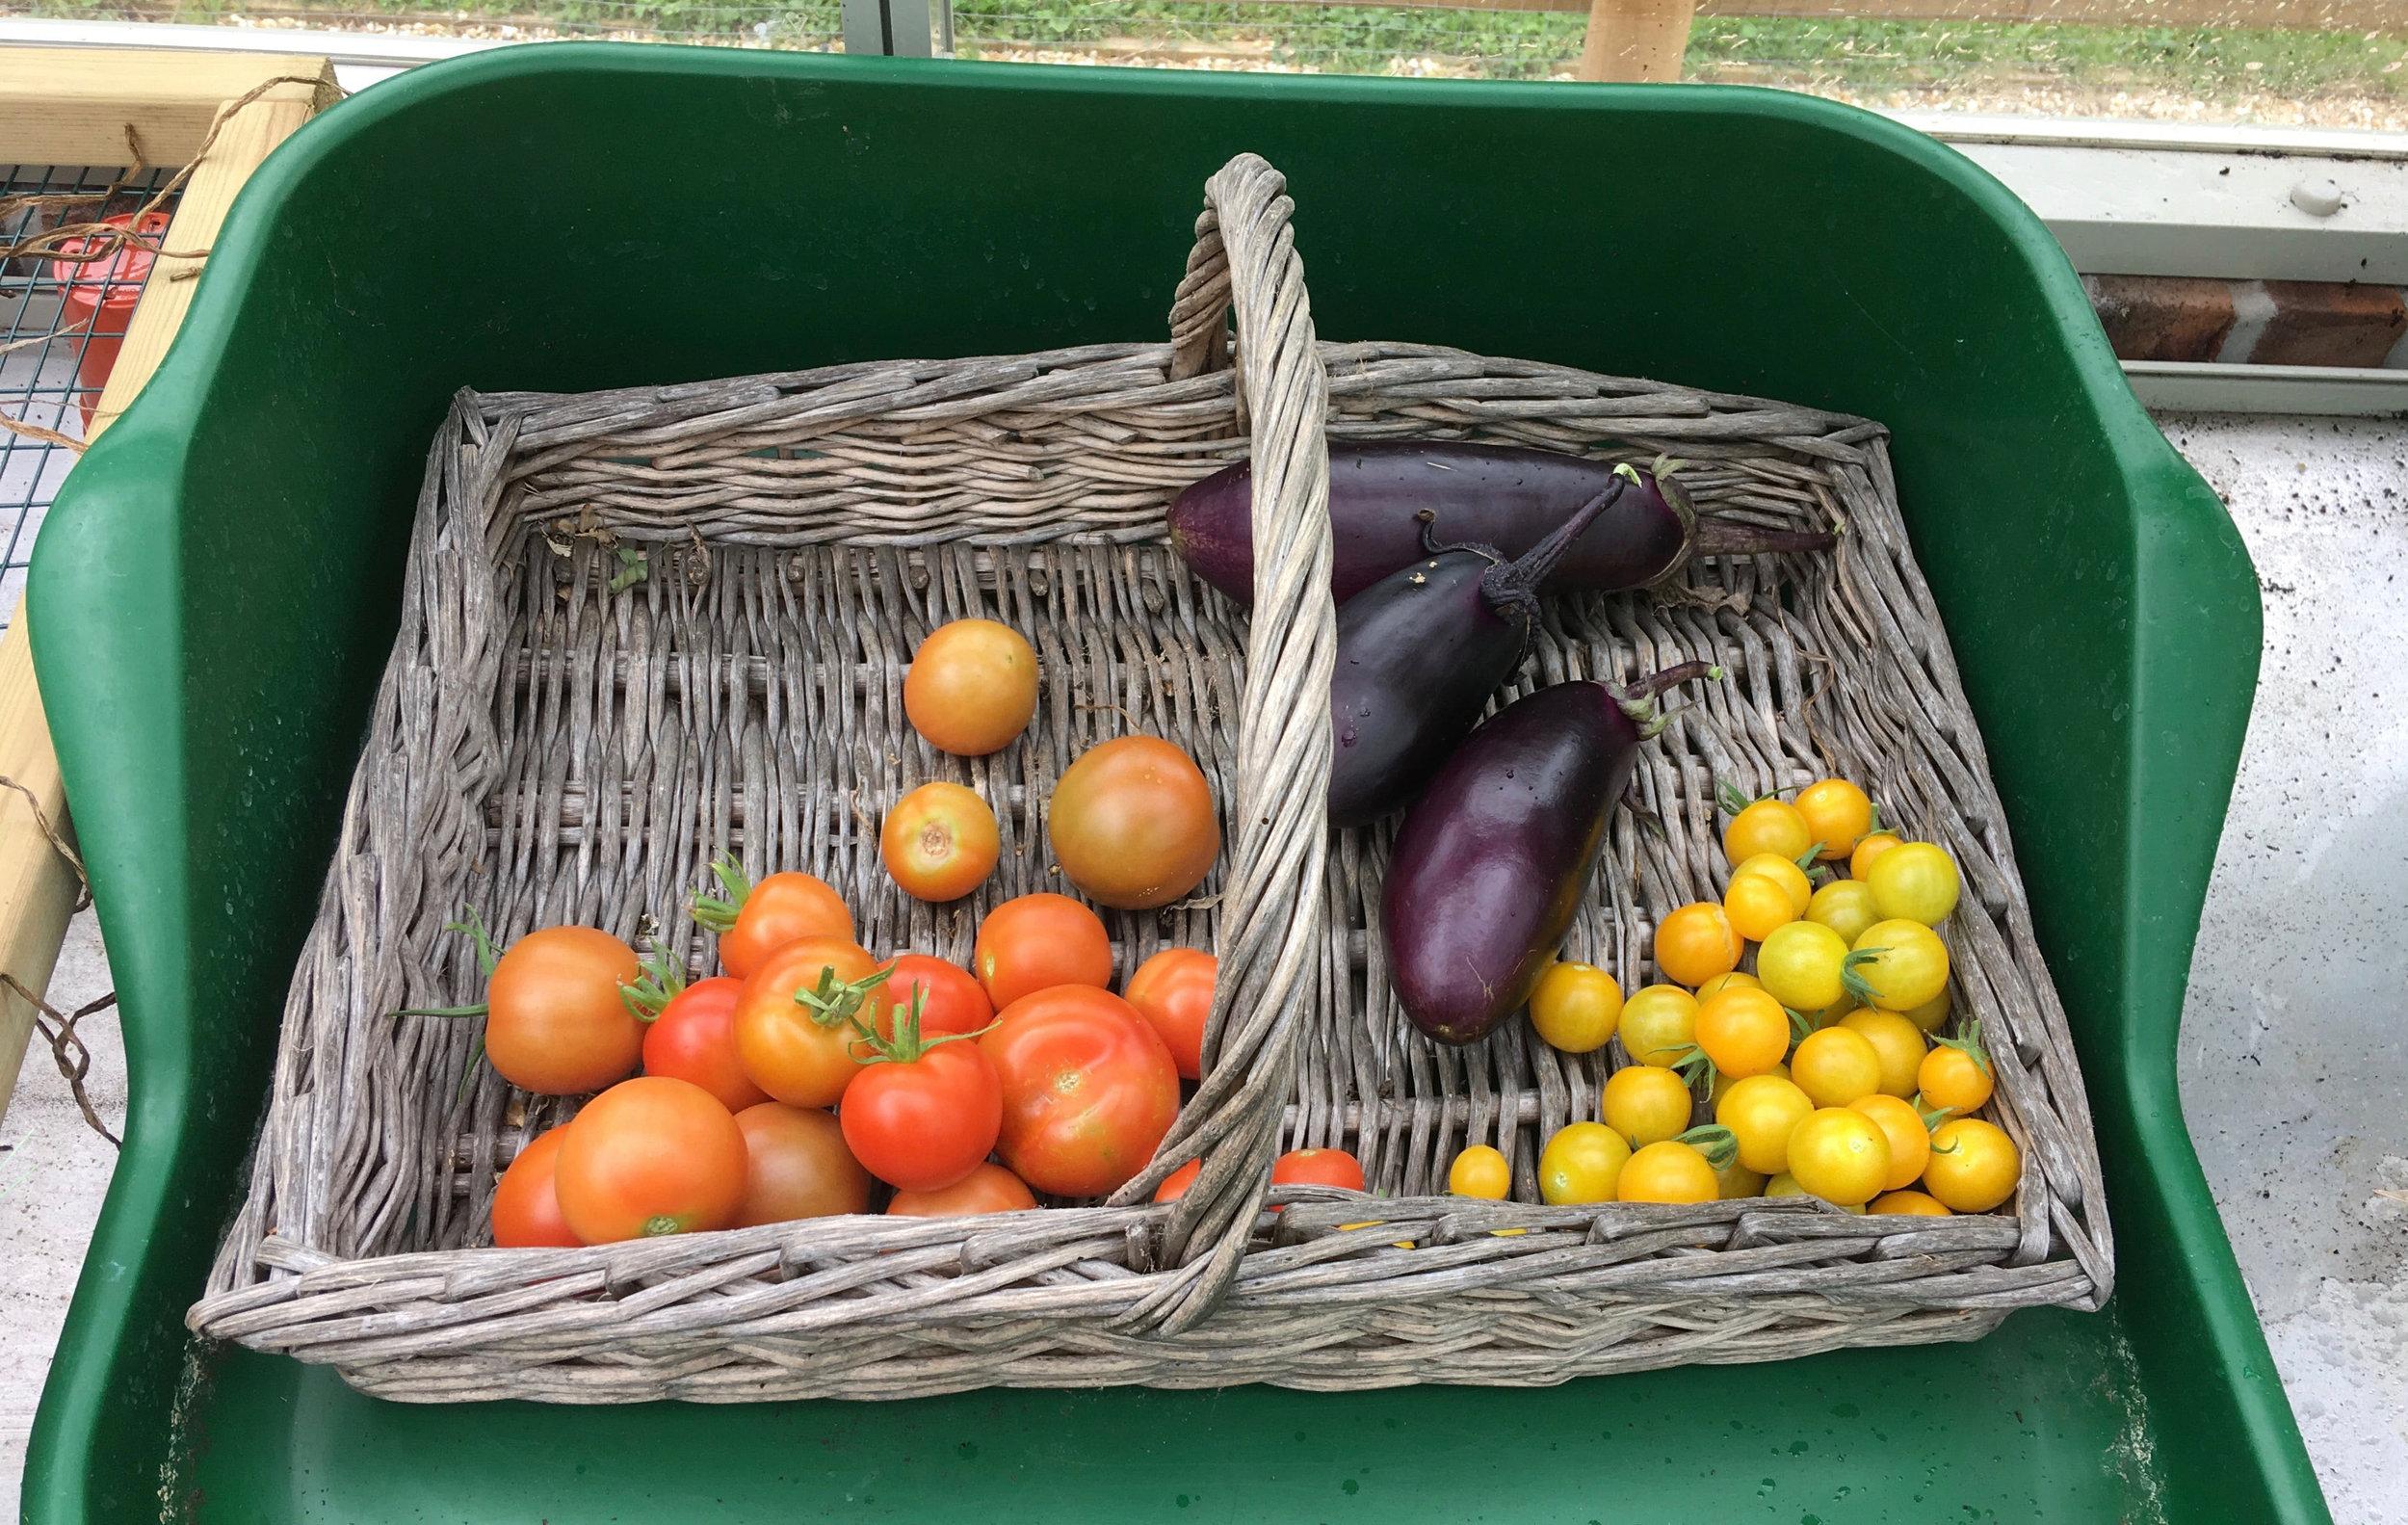 Greenhouse produce.jpg